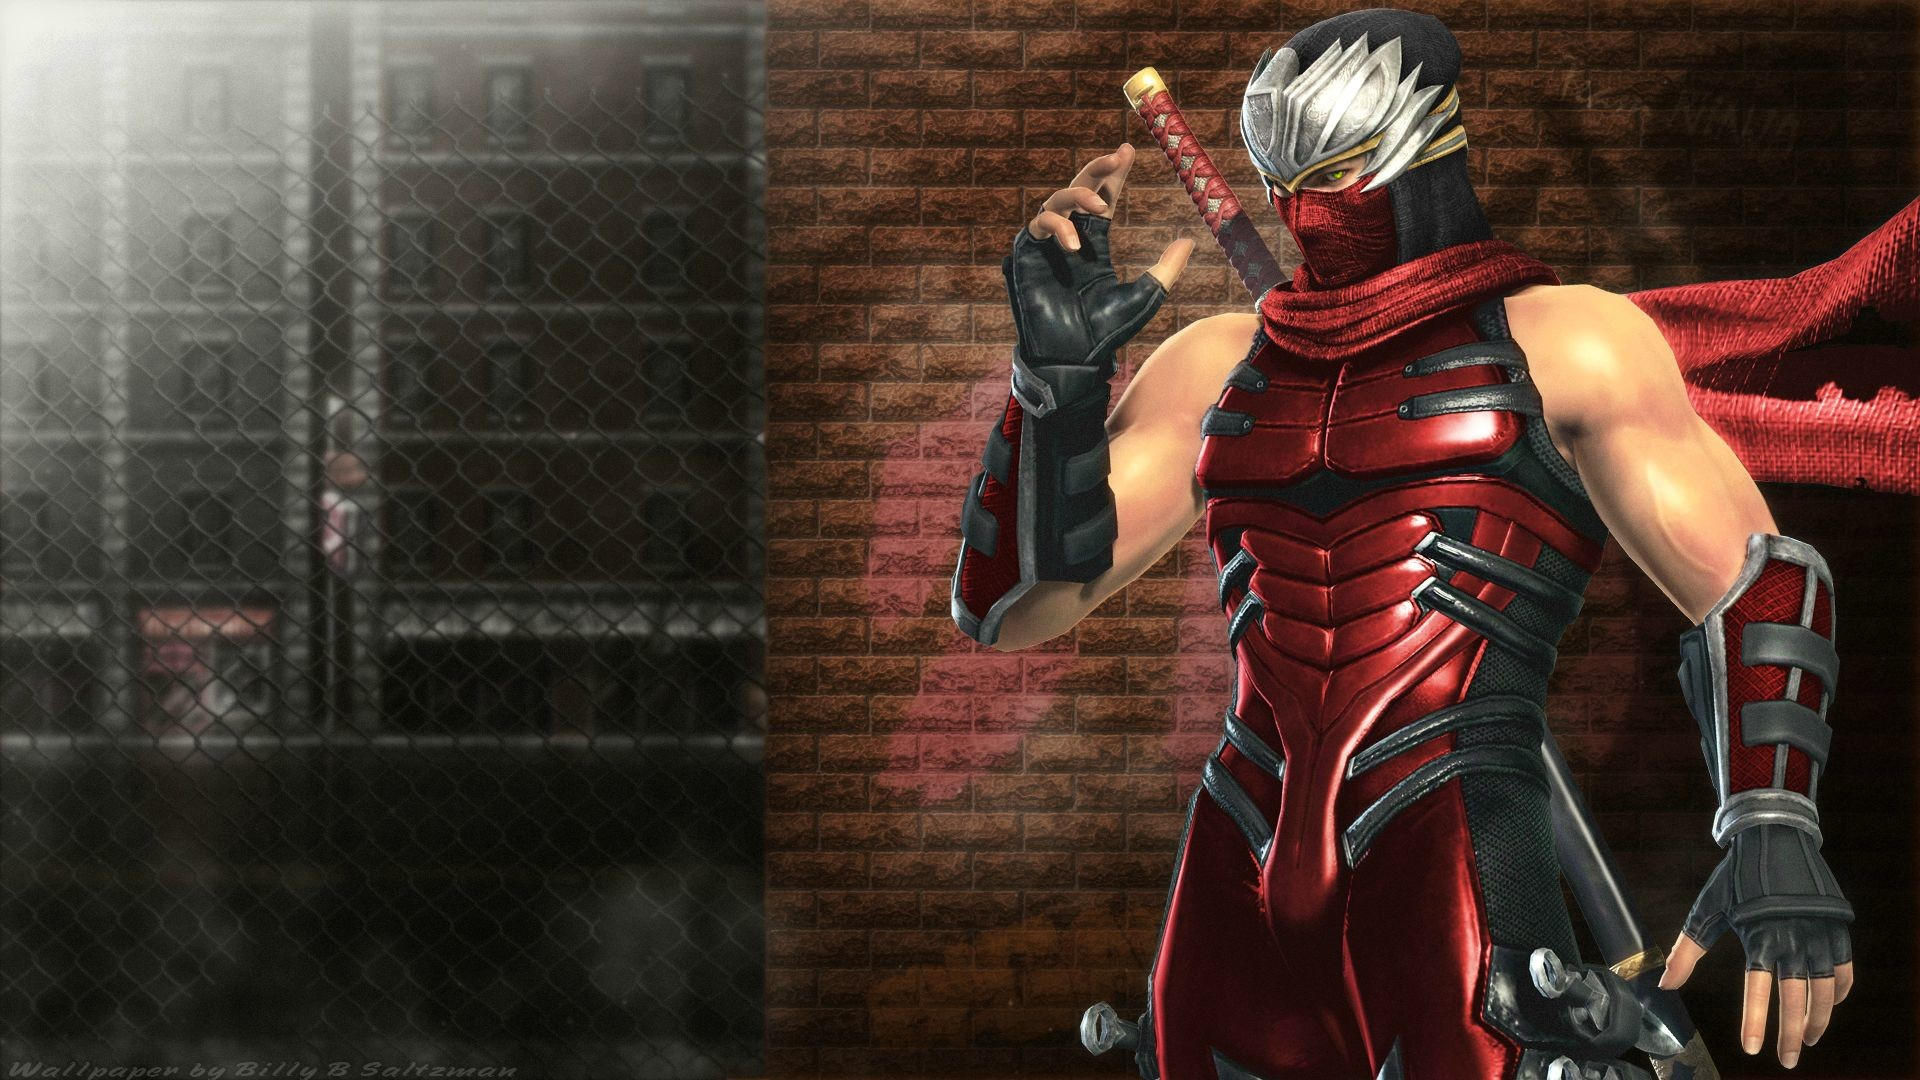 ninja gaiden black wallpaper ·①